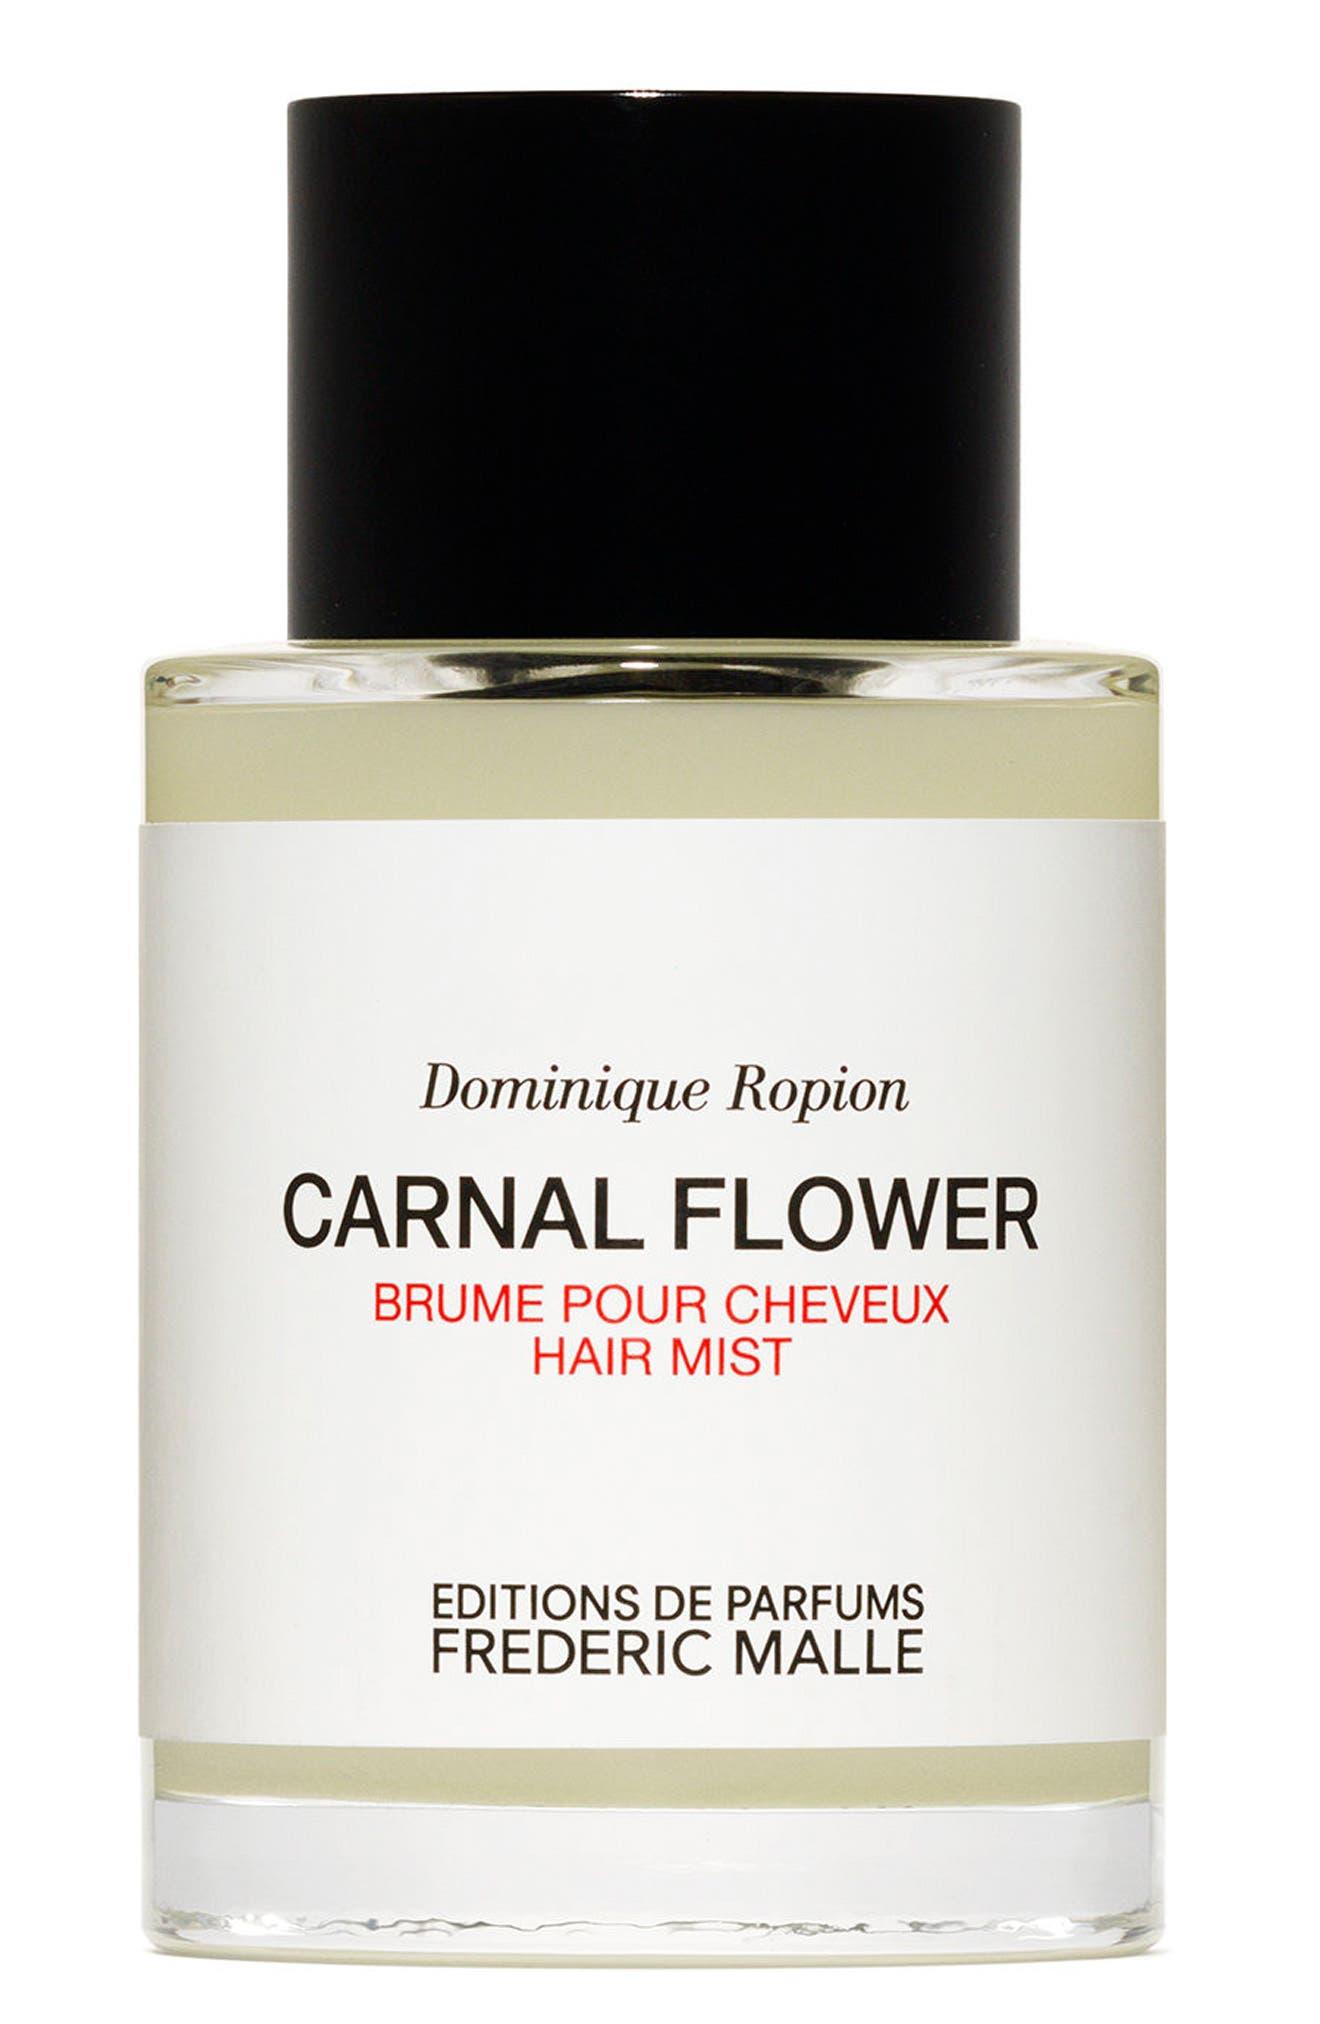 Carnal Flower Hair Mist